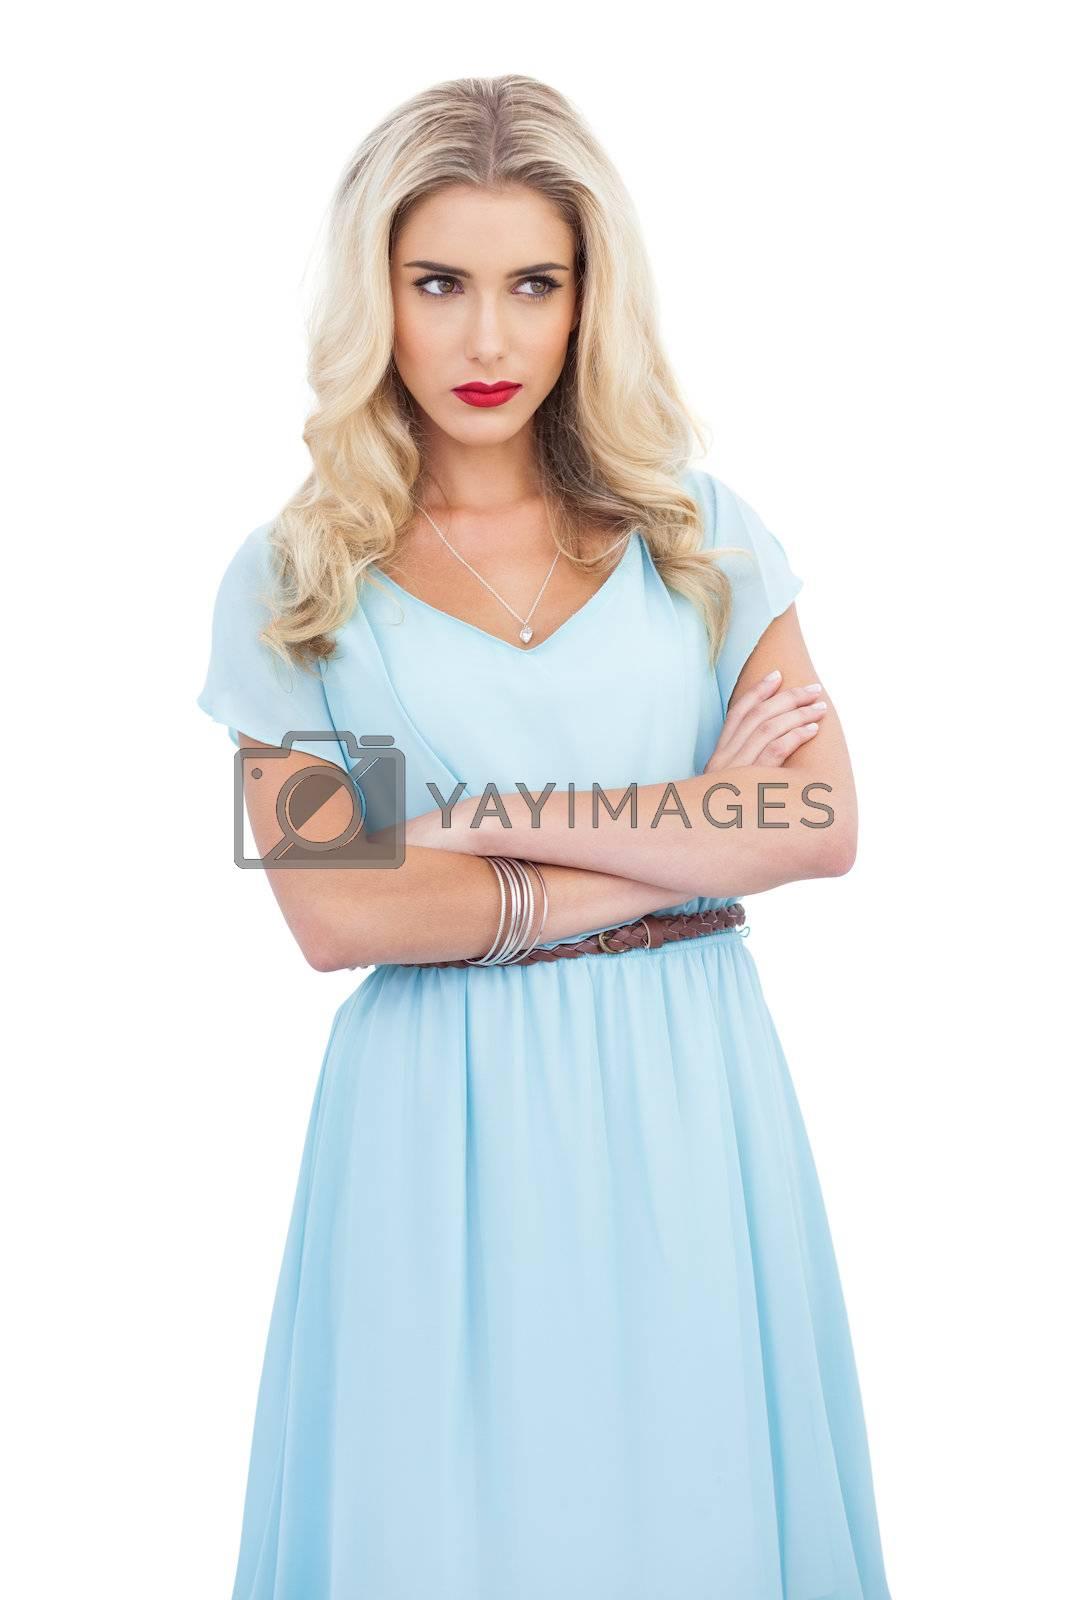 Thoughtful blonde model in blue dress posing crossed arms by Wavebreakmedia